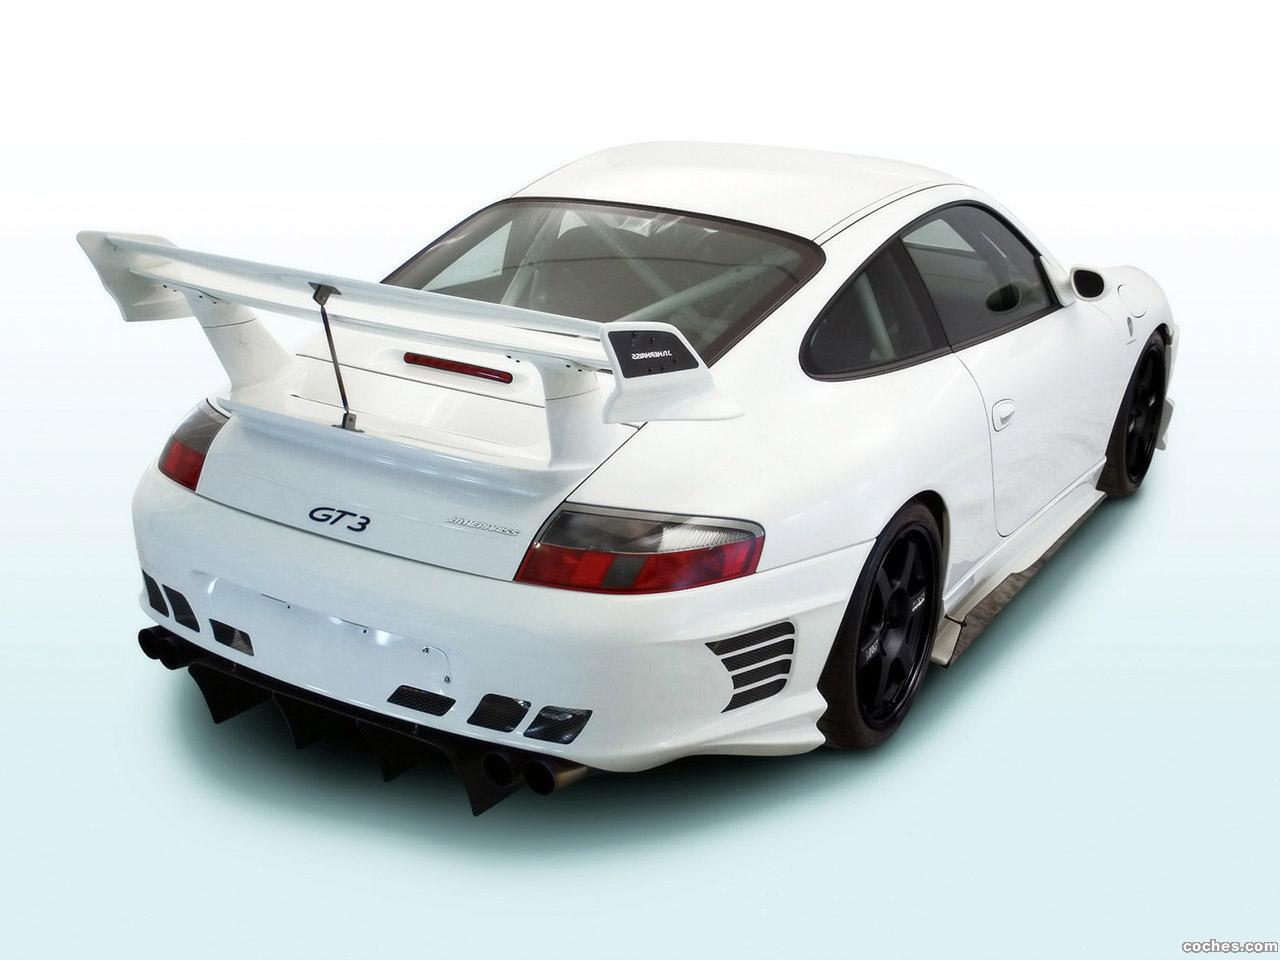 Foto 2 de J. N. Hepaiss Porsche  911 GT3 996 2006